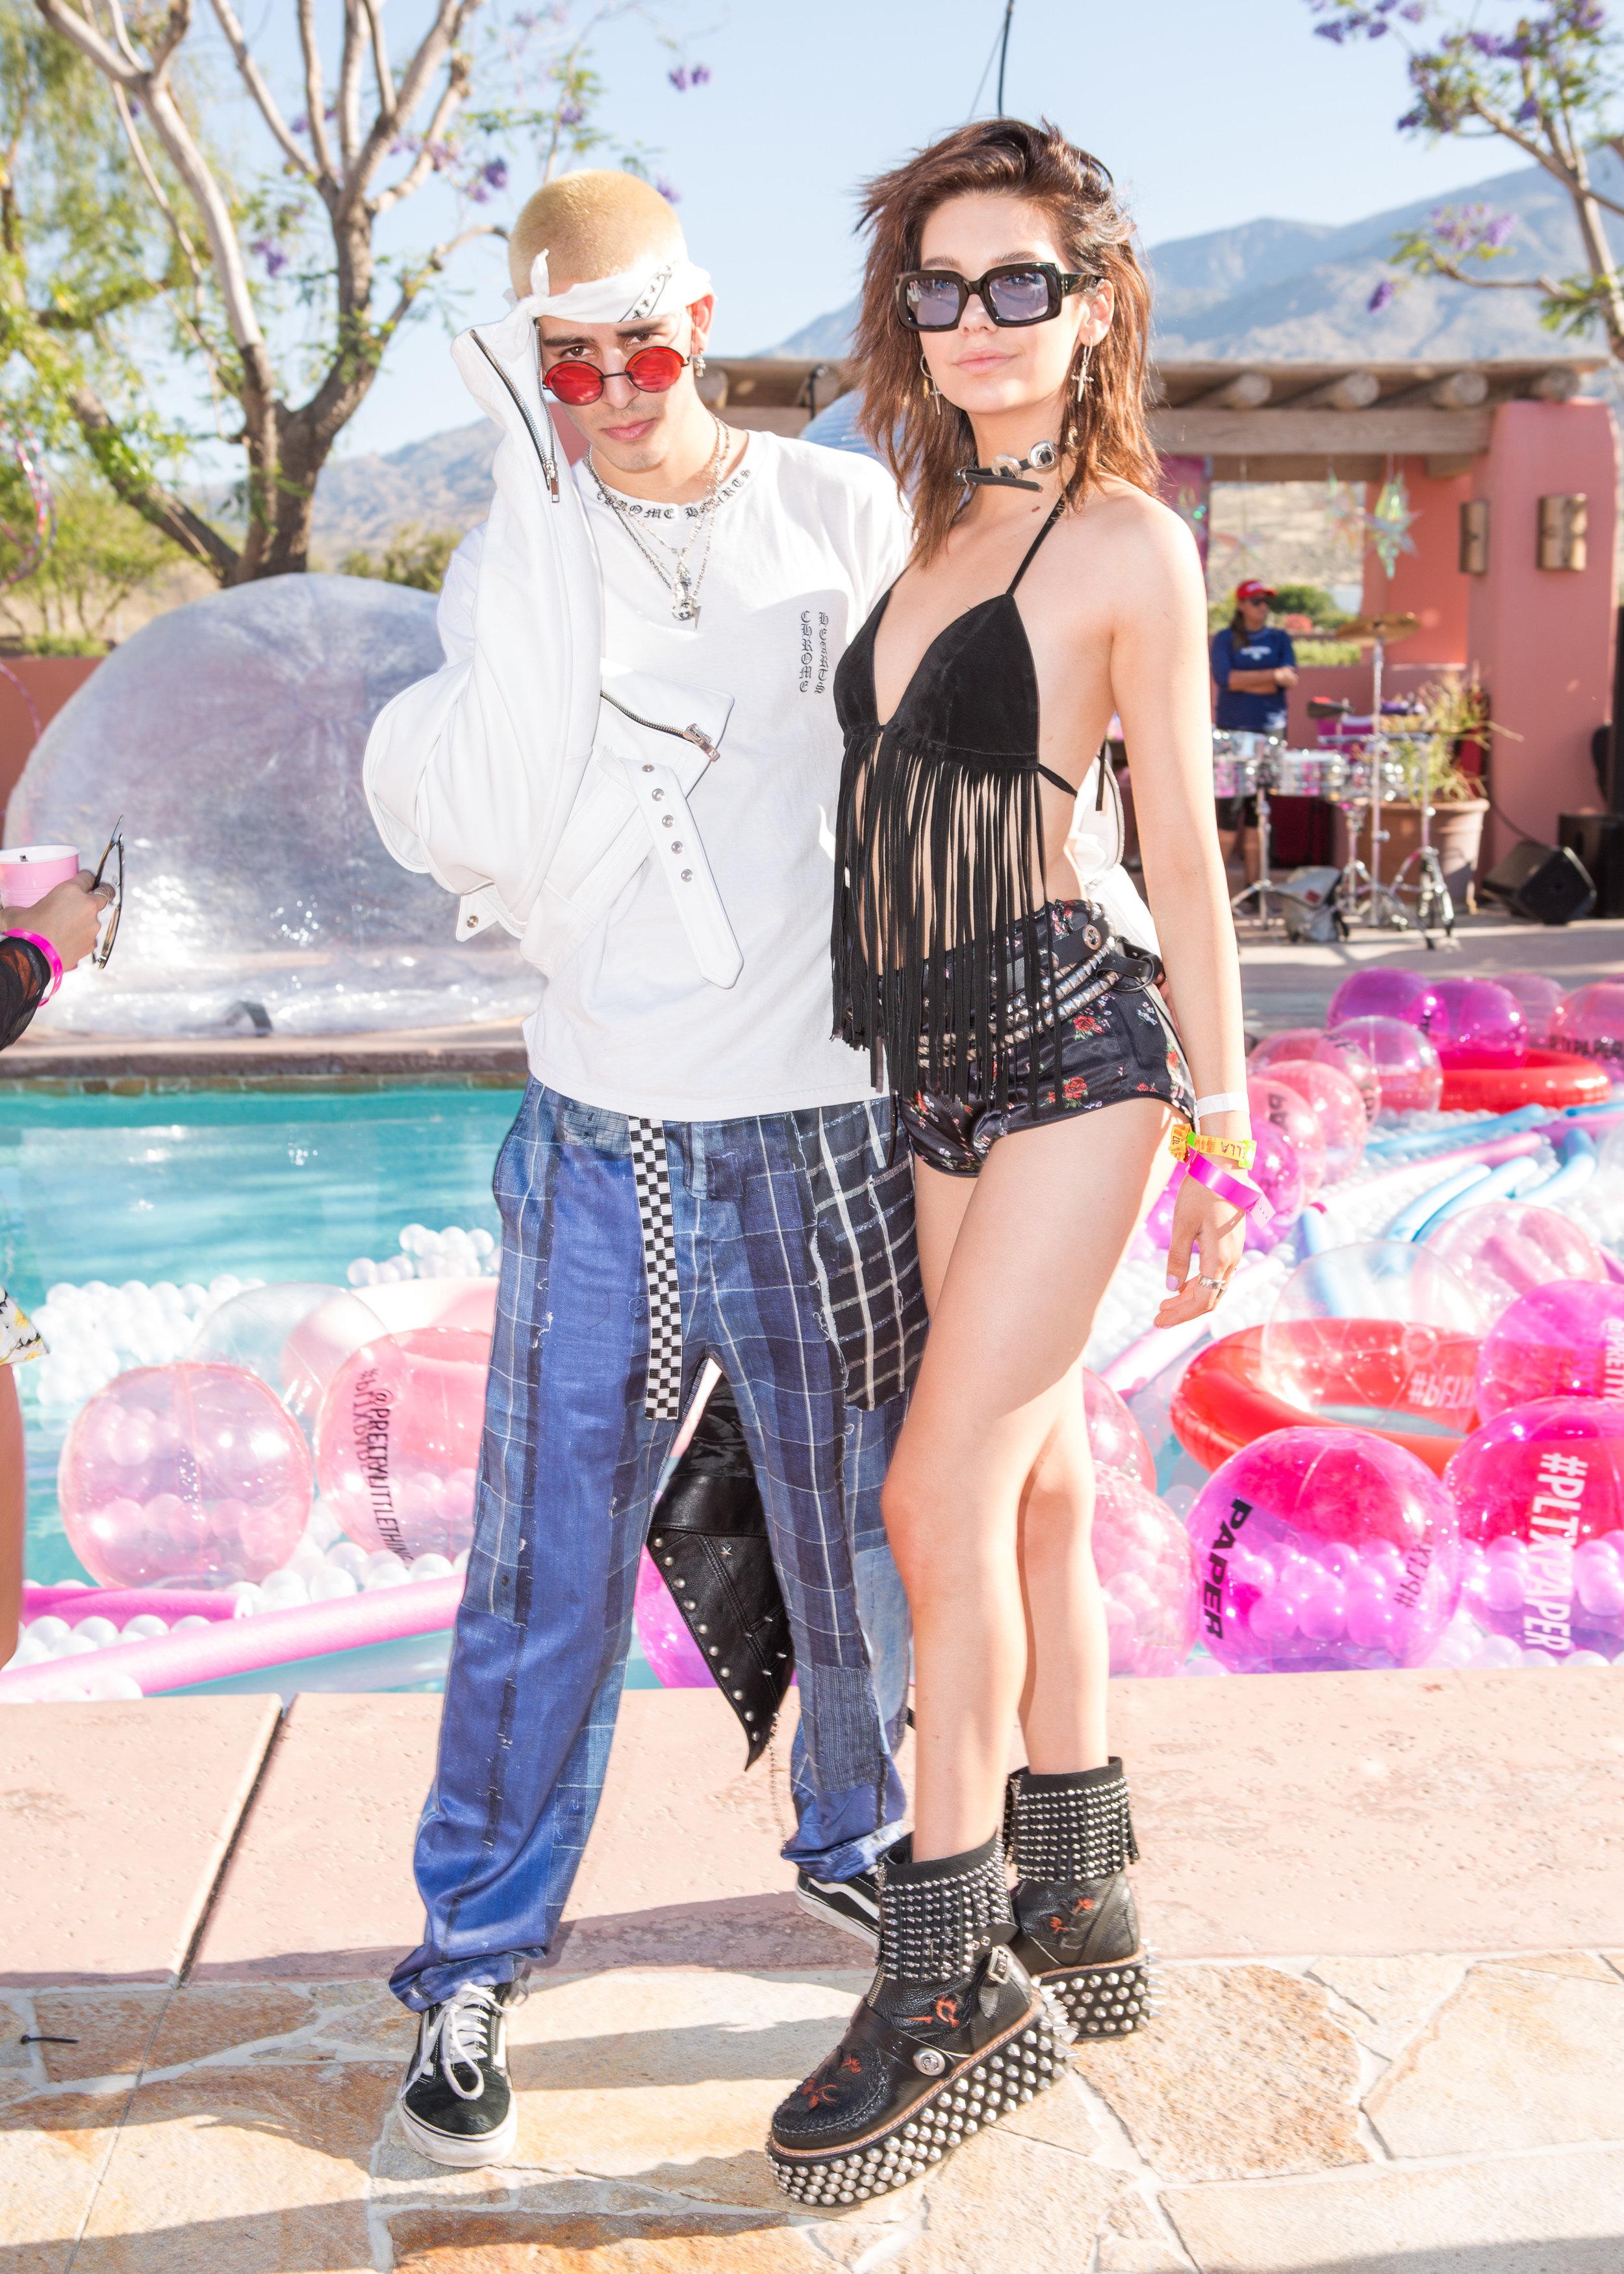 Ultimate Hollywood Coachella Poolside Party johnny zallez amanda steele.jpg